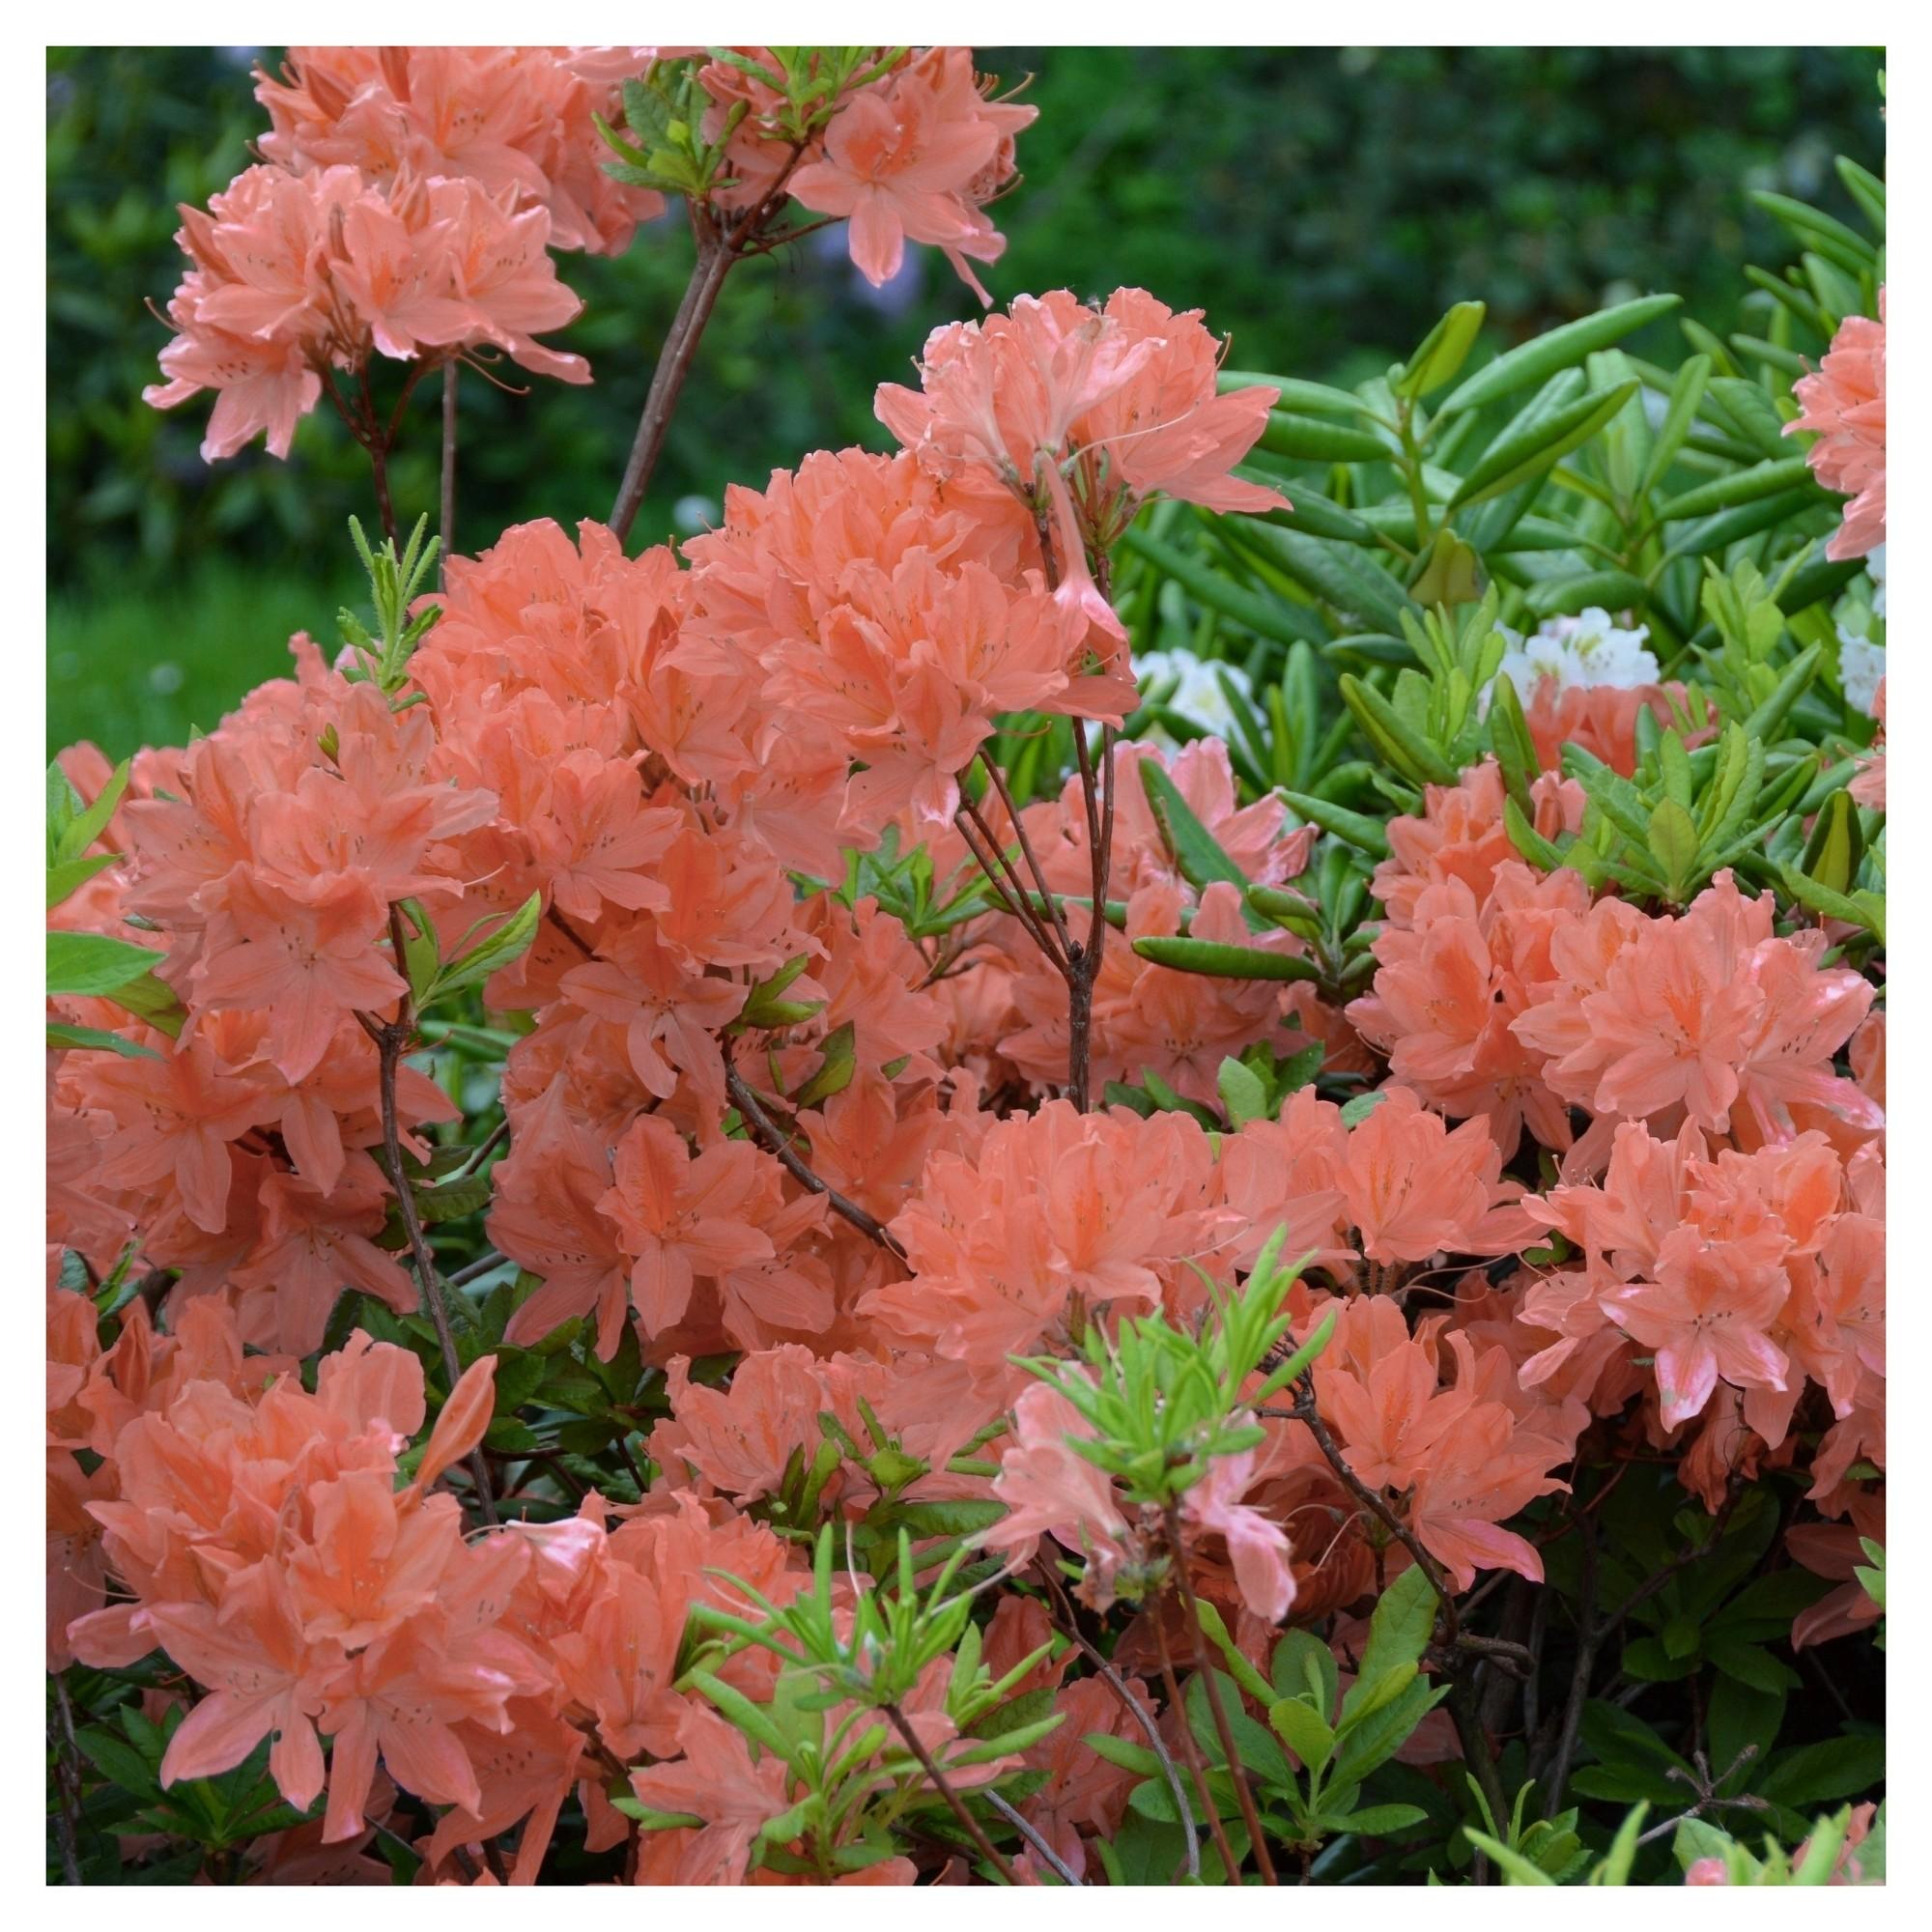 Azalea Blaauw S Pink 1pc National Plant Network U S D A Hardiness Zones 6 9 Plants Planting Flowers Flowering Shrubs